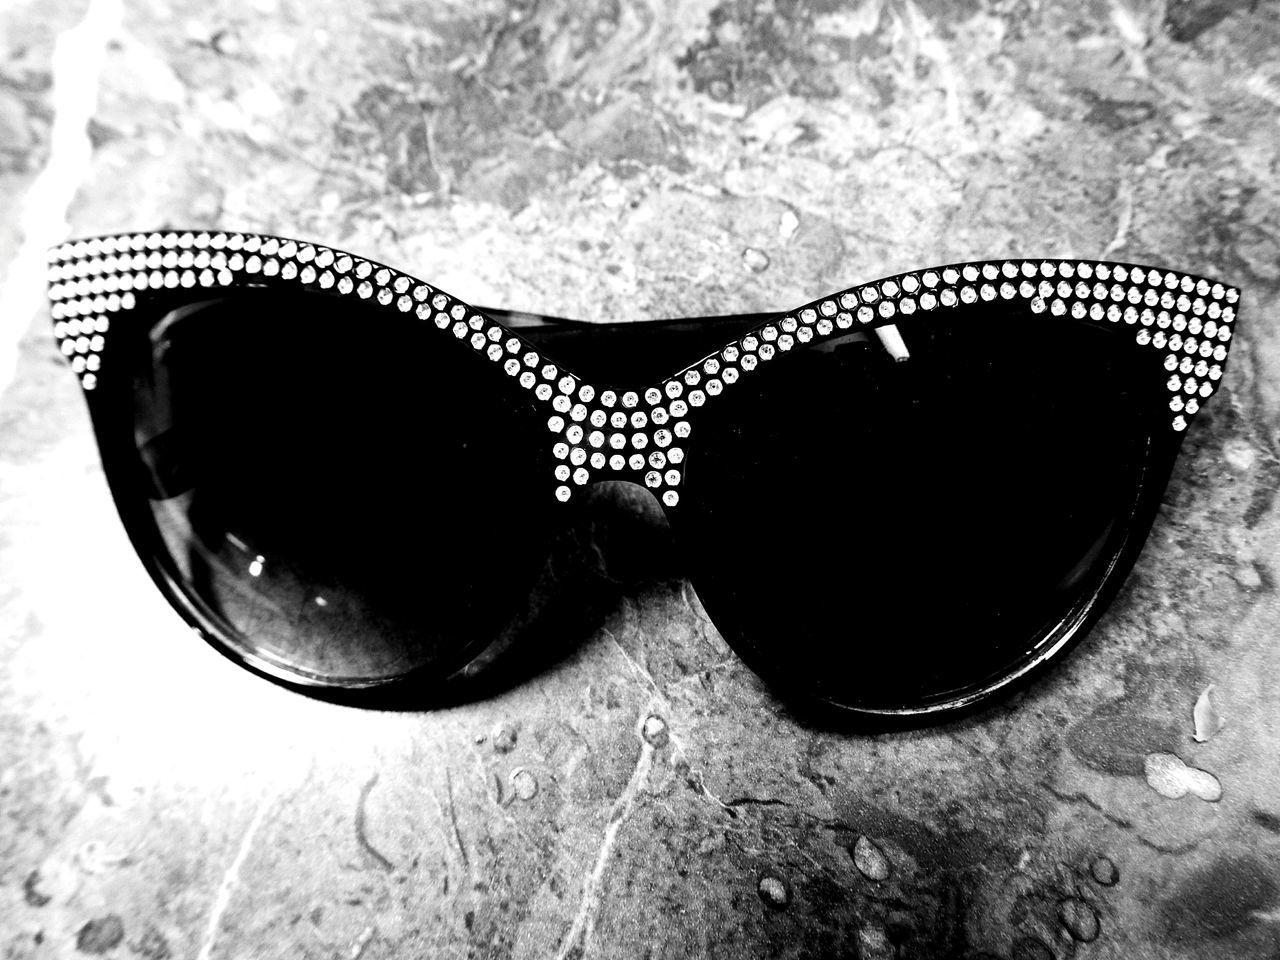 sunglasses, eyewear, fashion, cool, reflection, eye mask, protection, eyeglasses, eyesight, vision, no people, modern, close-up, outdoors, day